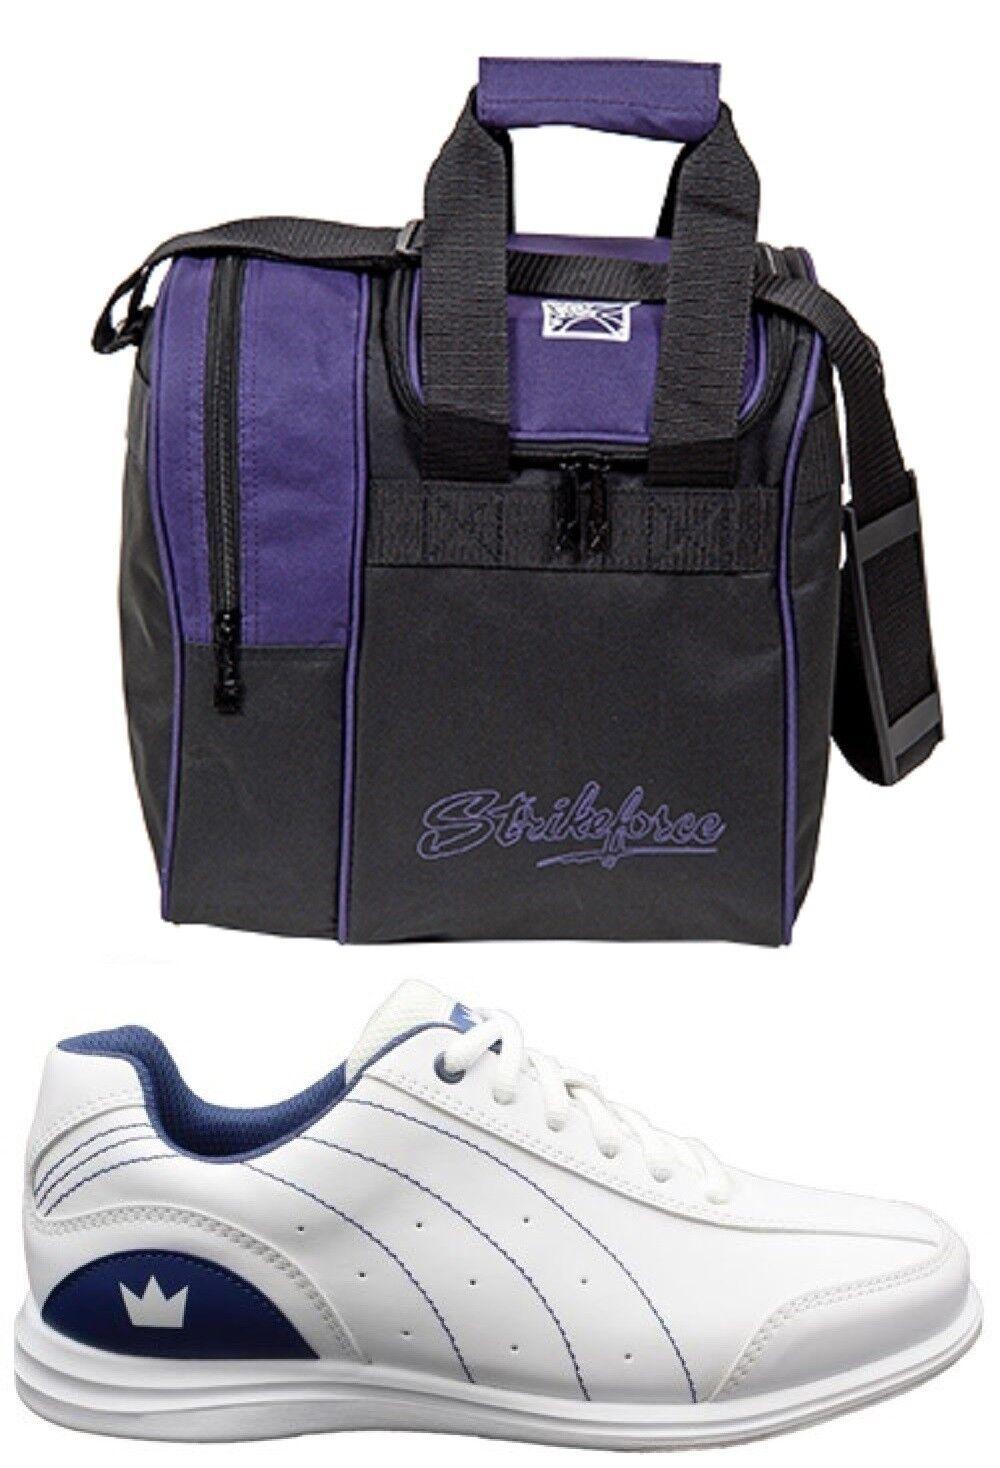 Womens MYSTIC Bowling Ball shoes White bluee Sizes 7-11 WIDE & Purple 1 Ball Bag